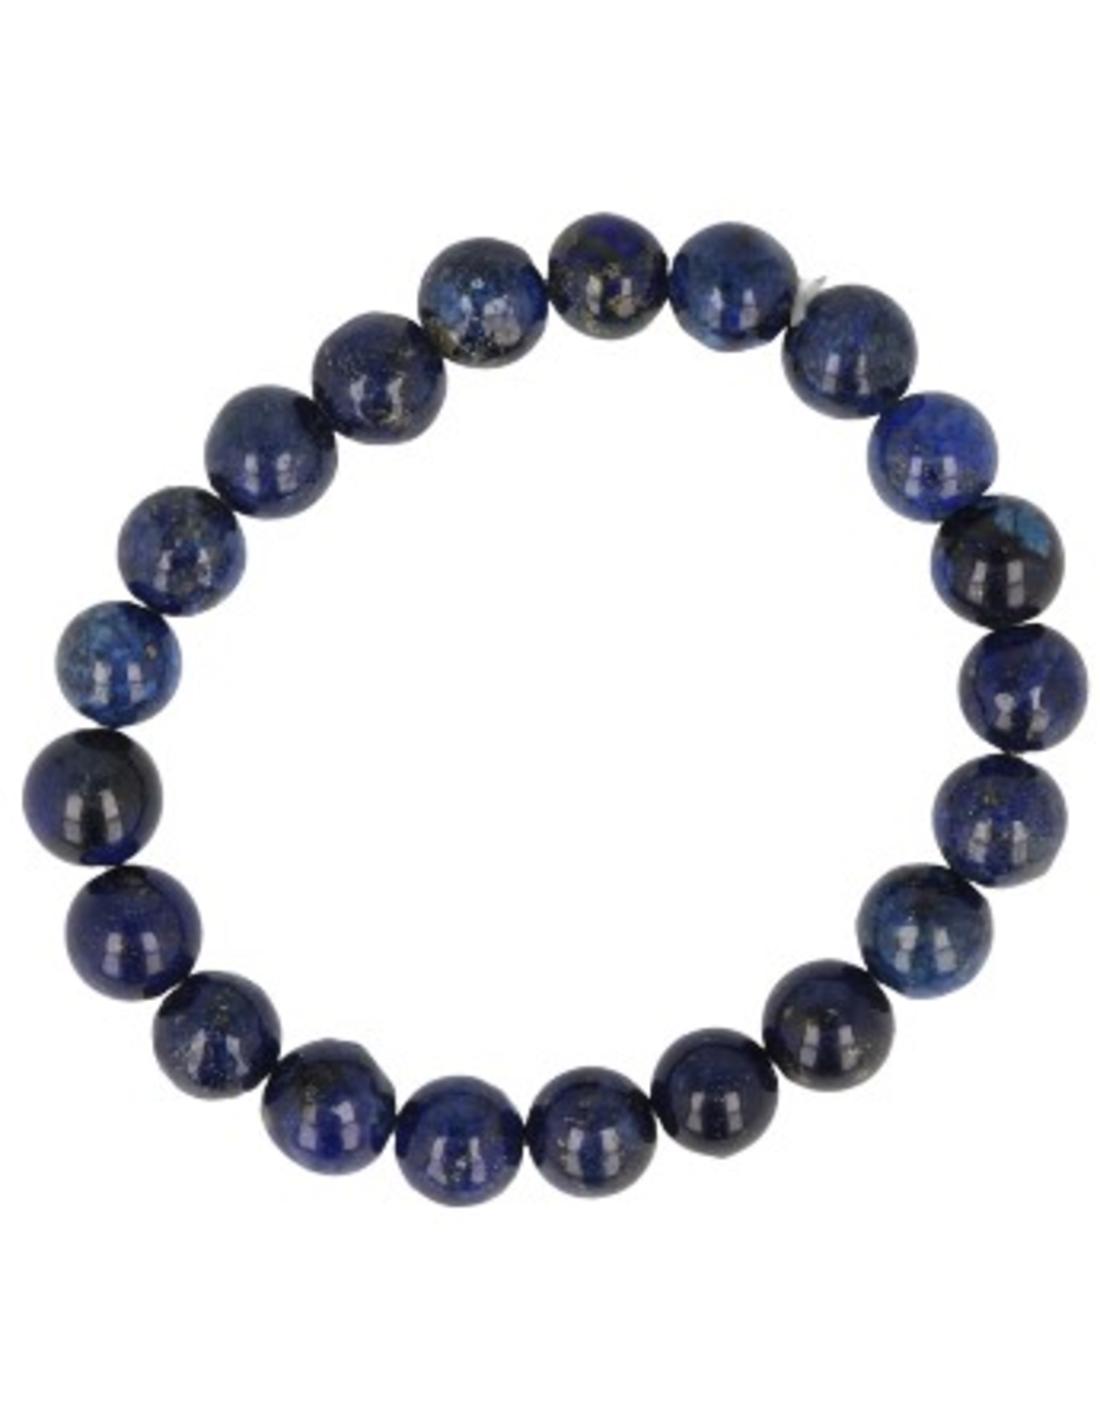 Lapis Lazuli kralenarmband 8 mm (bijgekleurd)